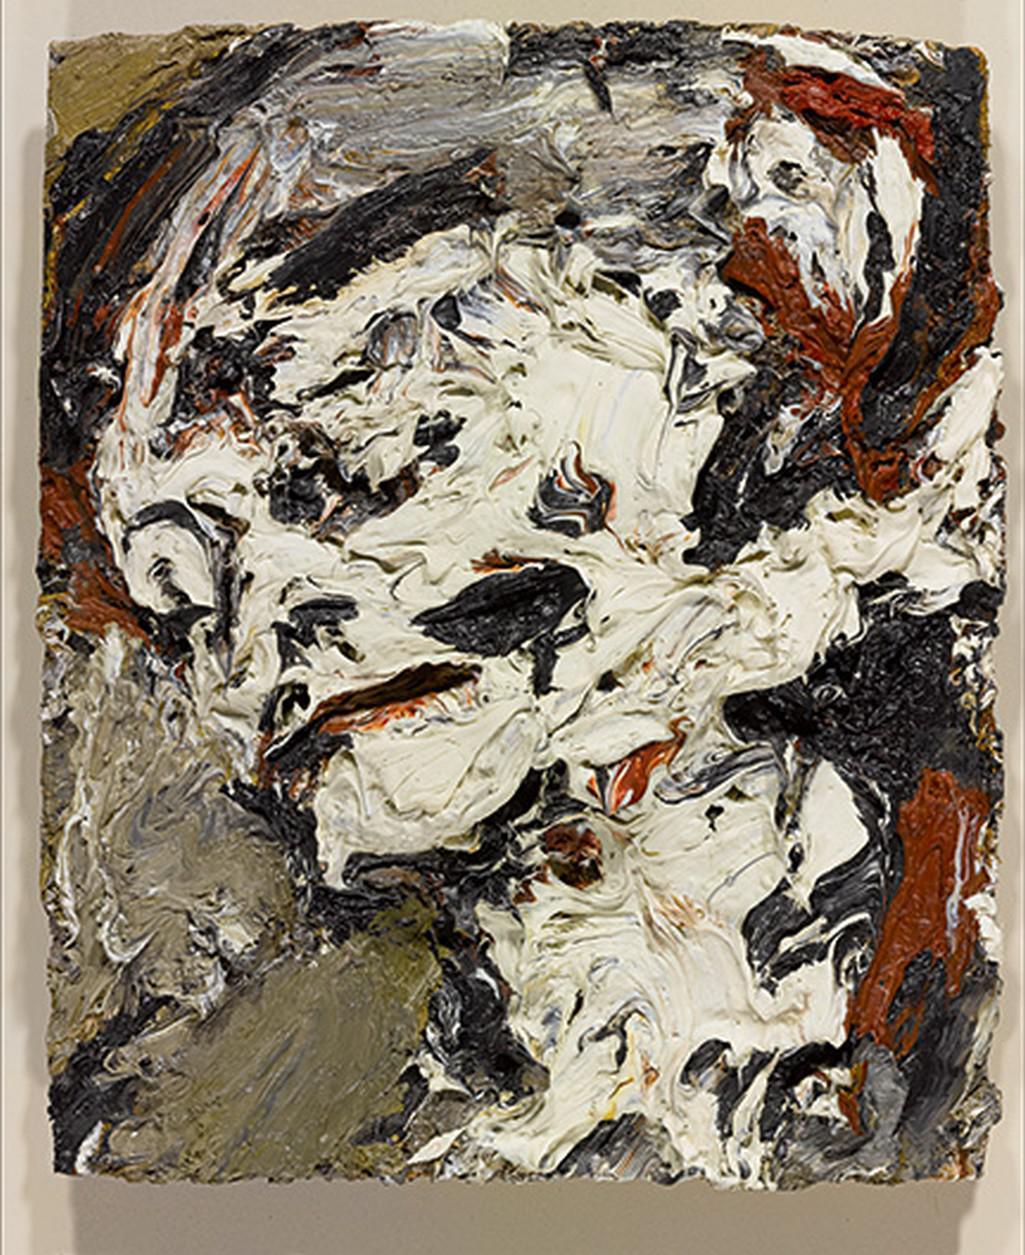 Frank Auerbach / Hlava Gerdy Boehm, 1965